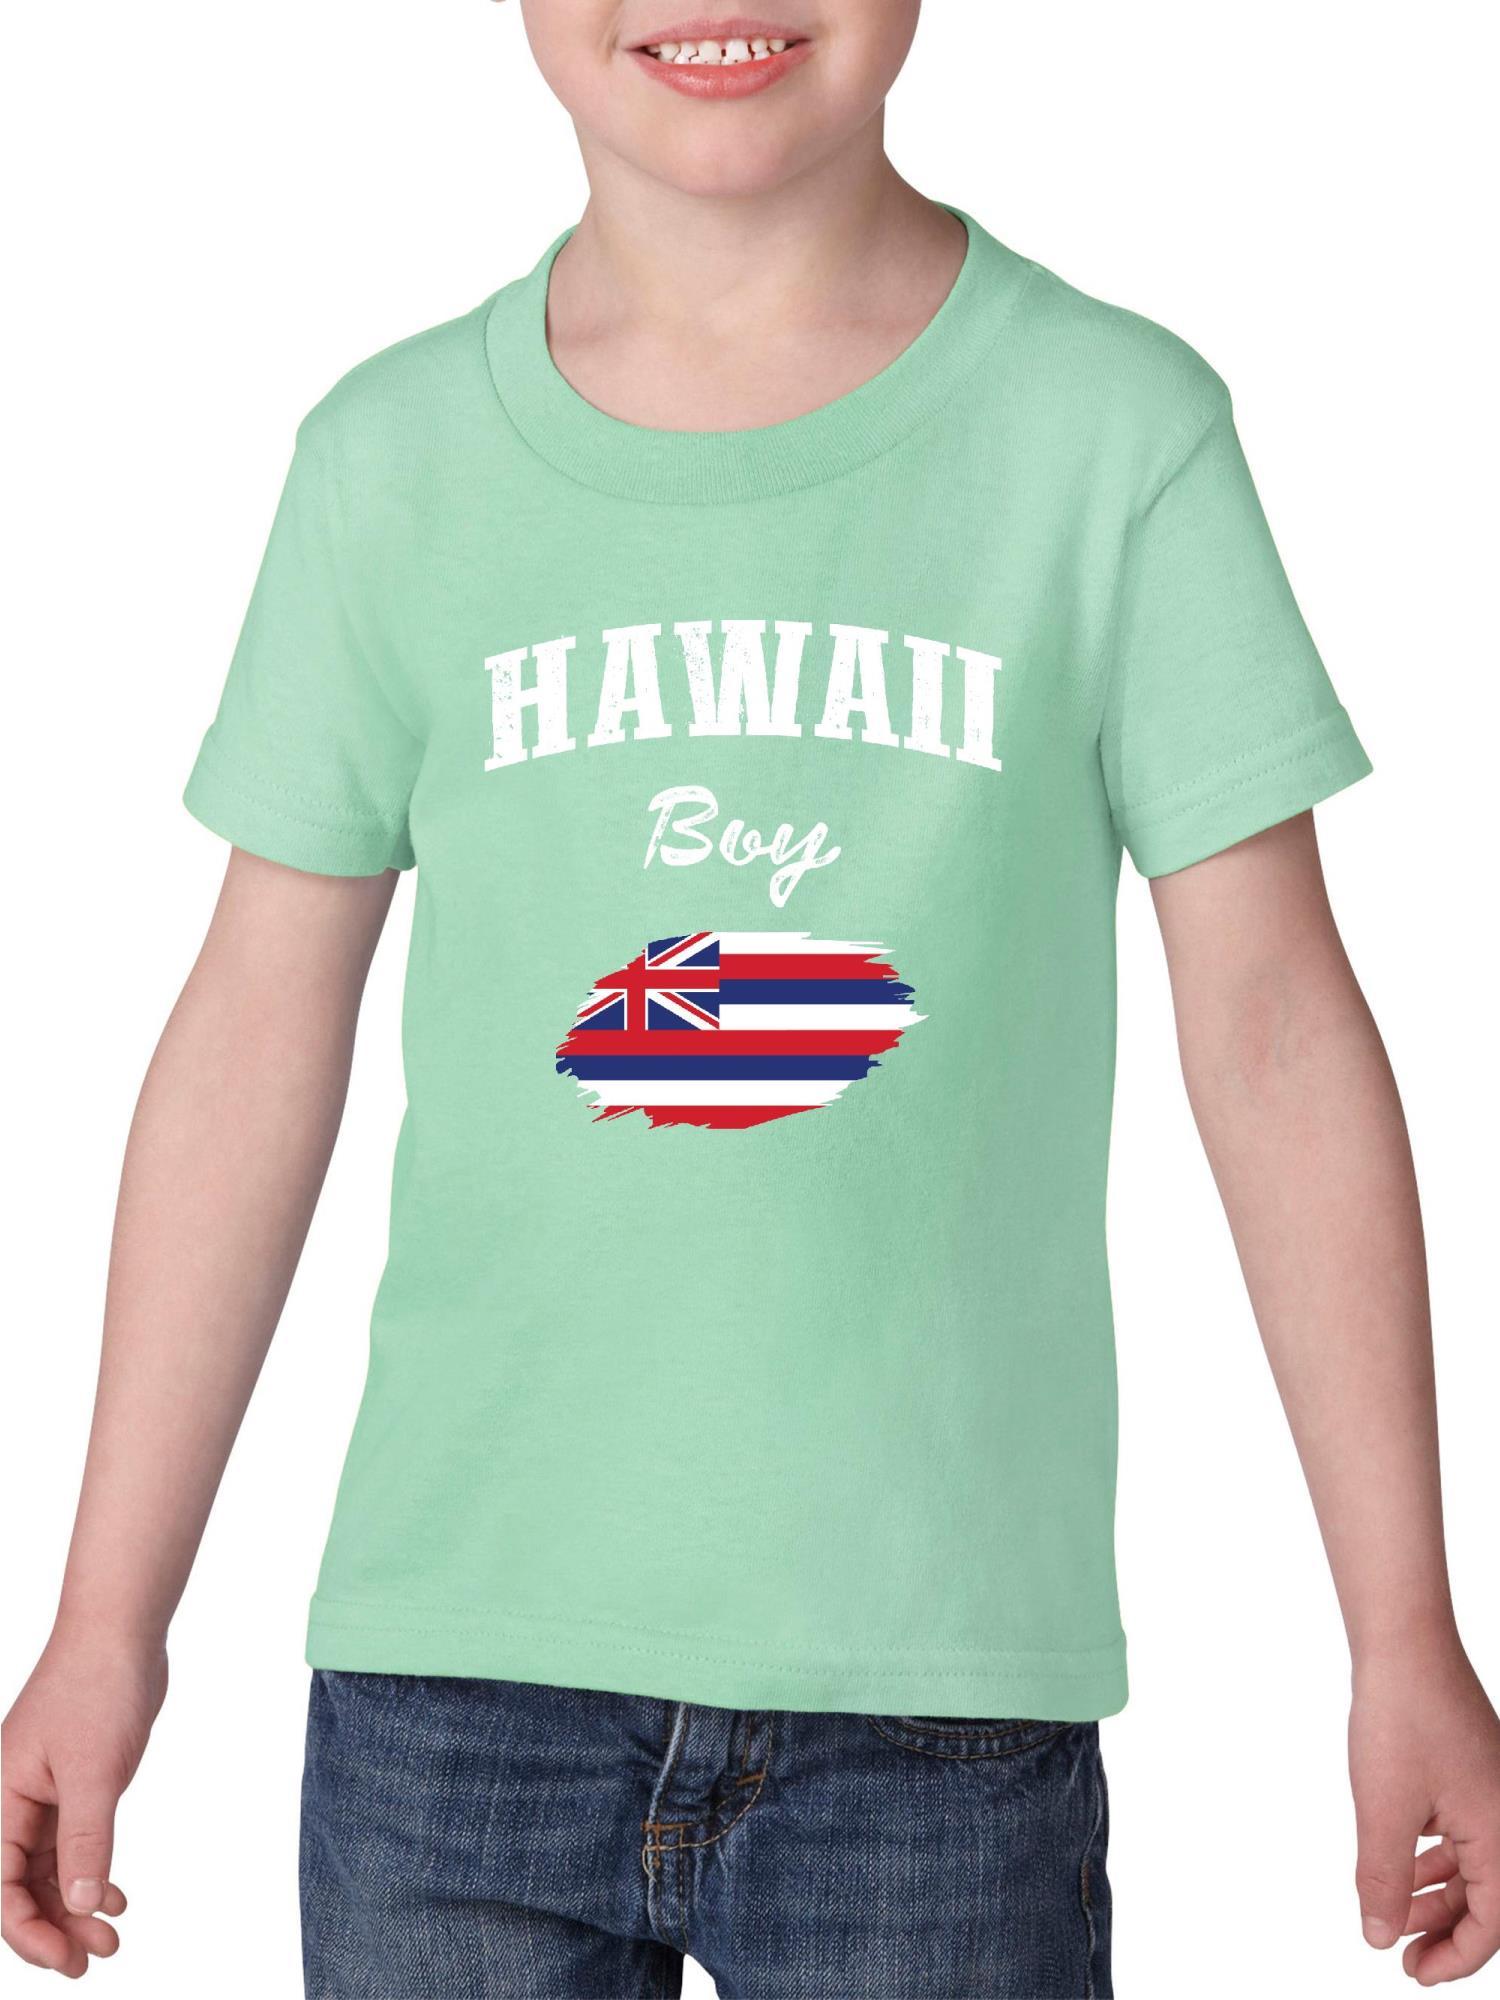 Hawaii Boy Heavy Cotton Toddler Kids T-Shirt Tee Clothing